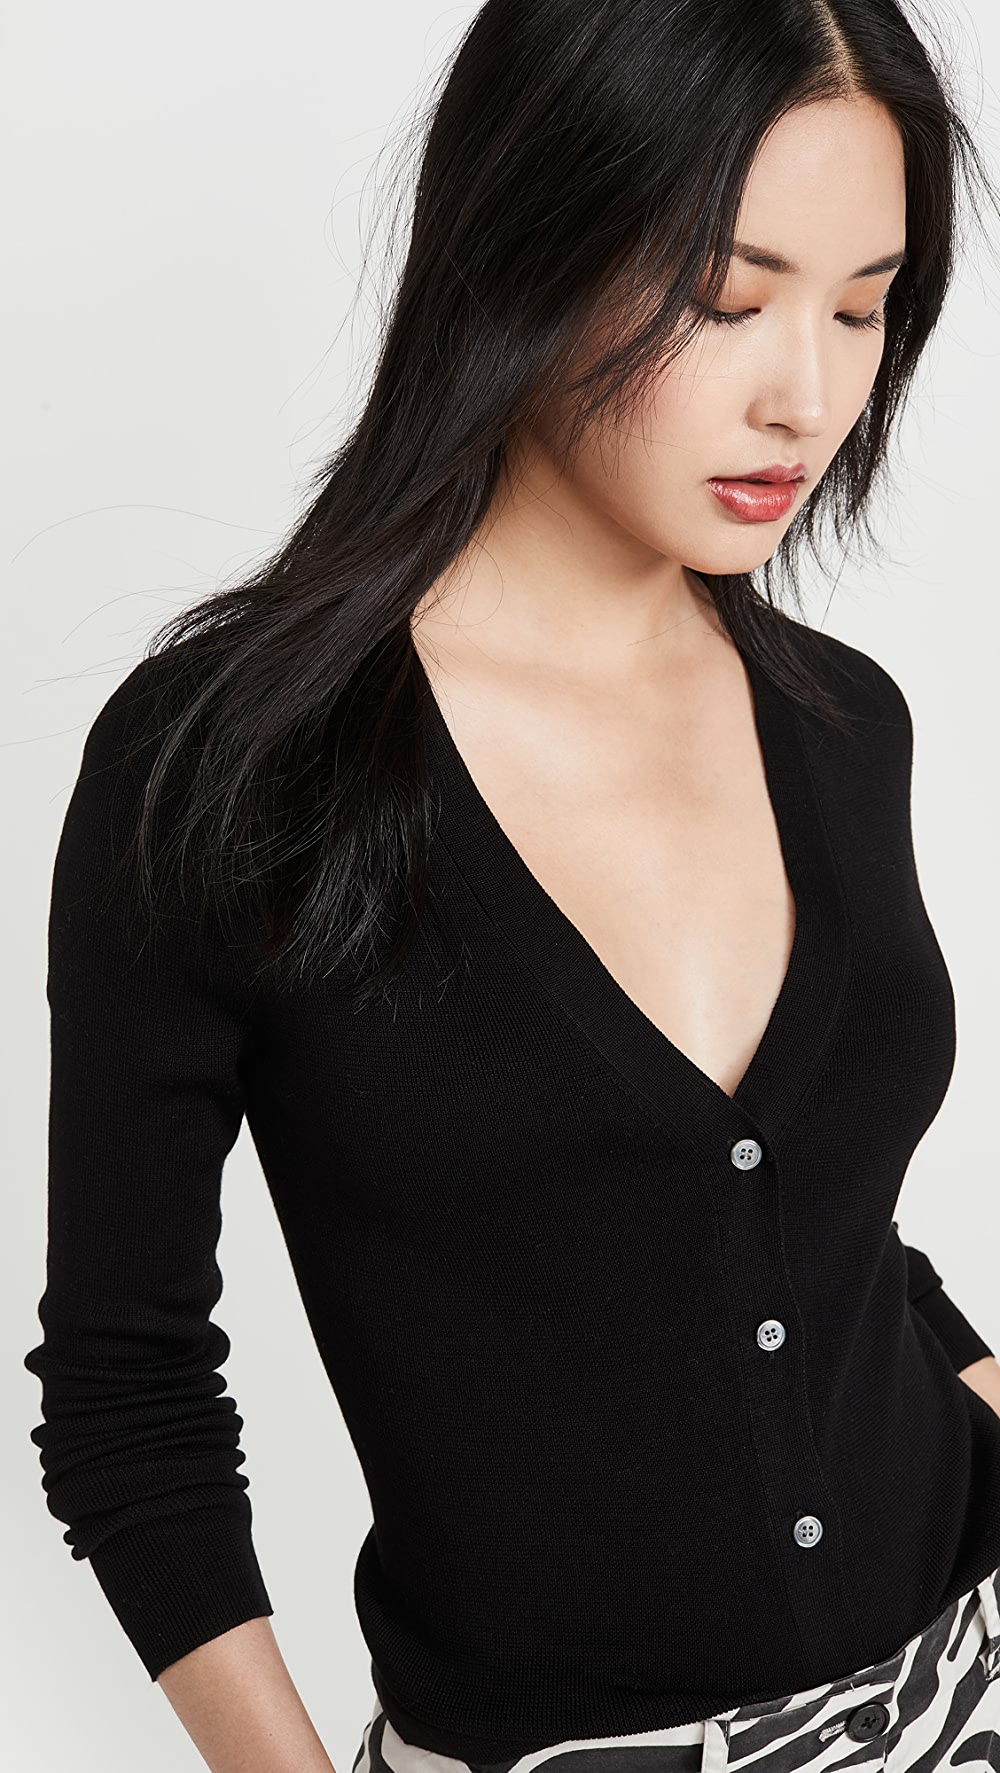 2019 Latest Design Nili Lotan - Ludlow Cardigan Cheap Sales 50%